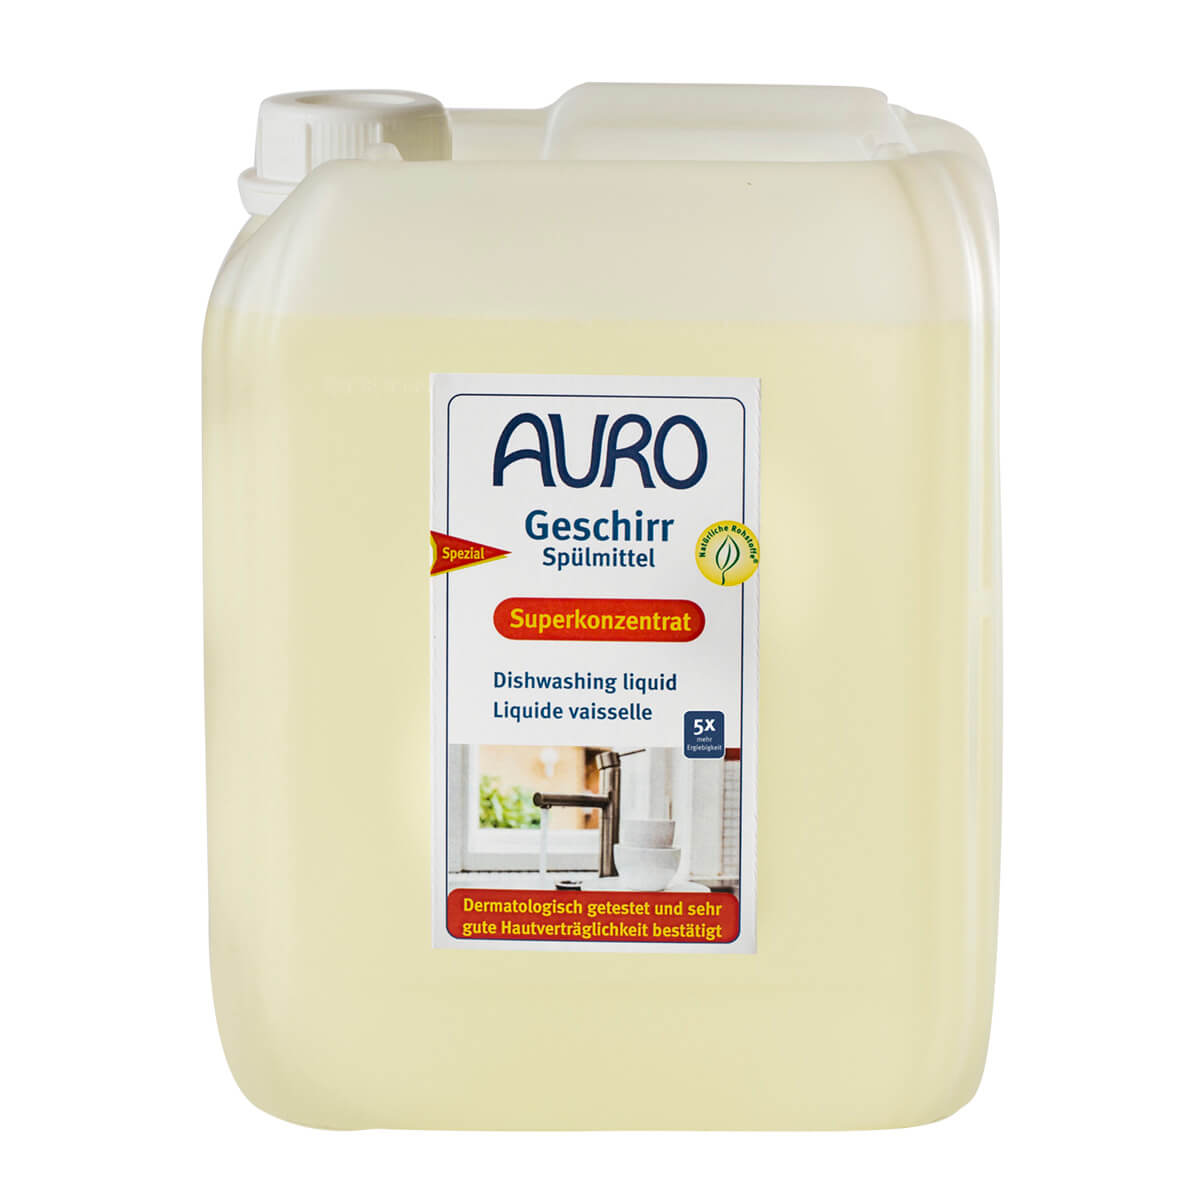 AURO Geschirrspülmittel Nr. 473 5,00L